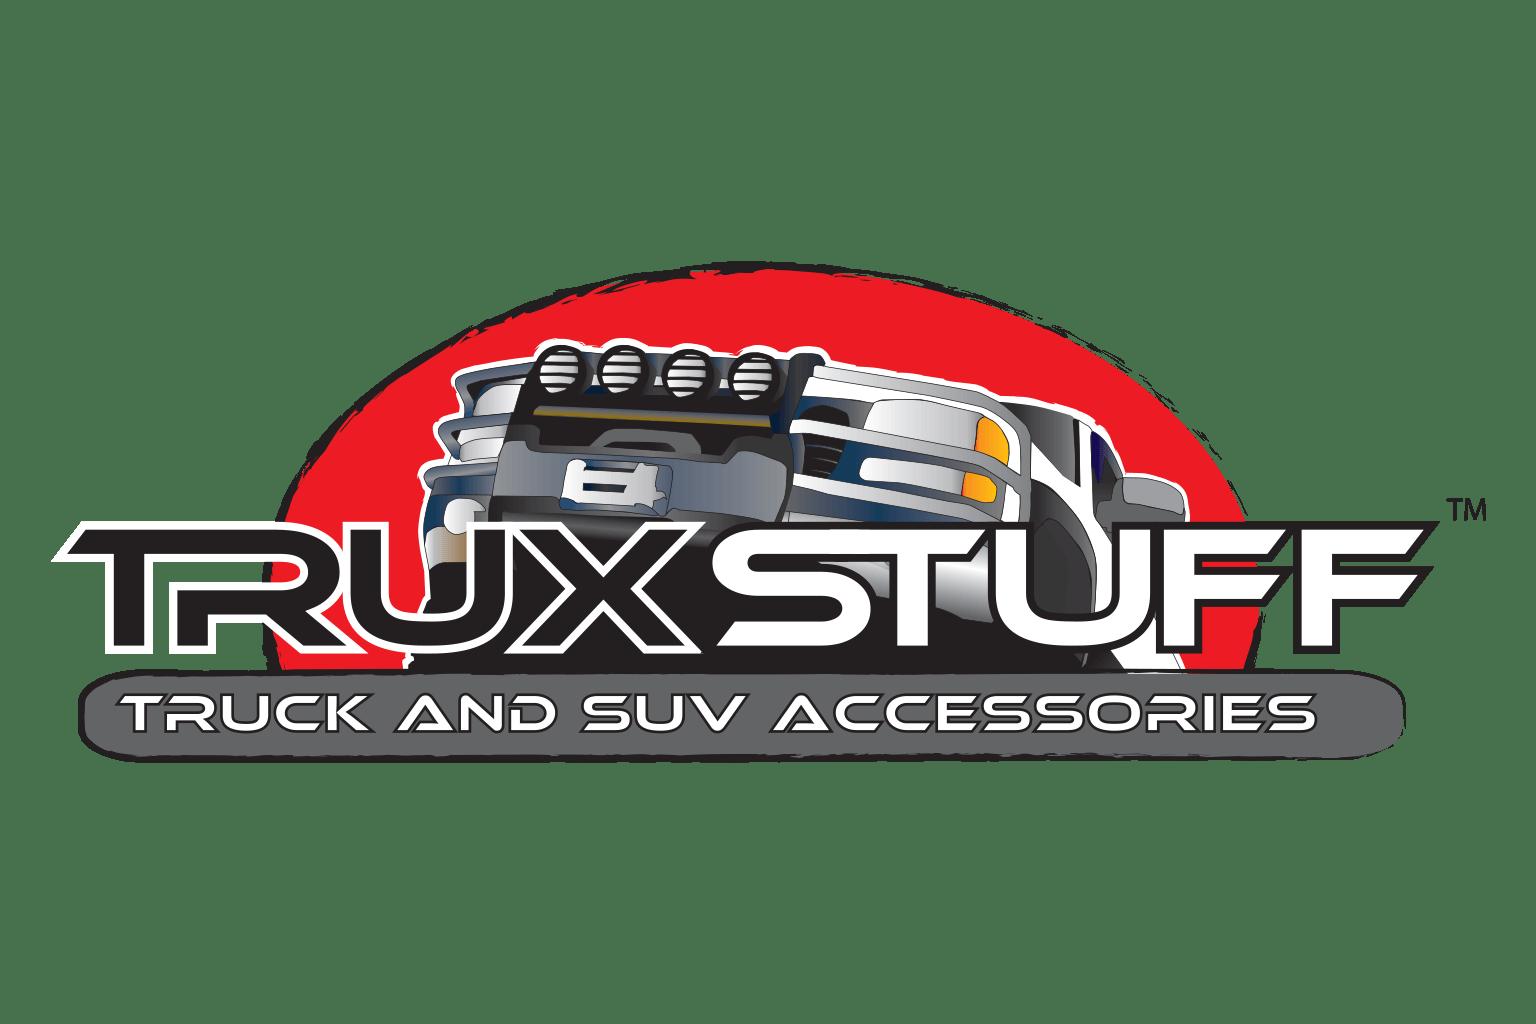 Truxstuff